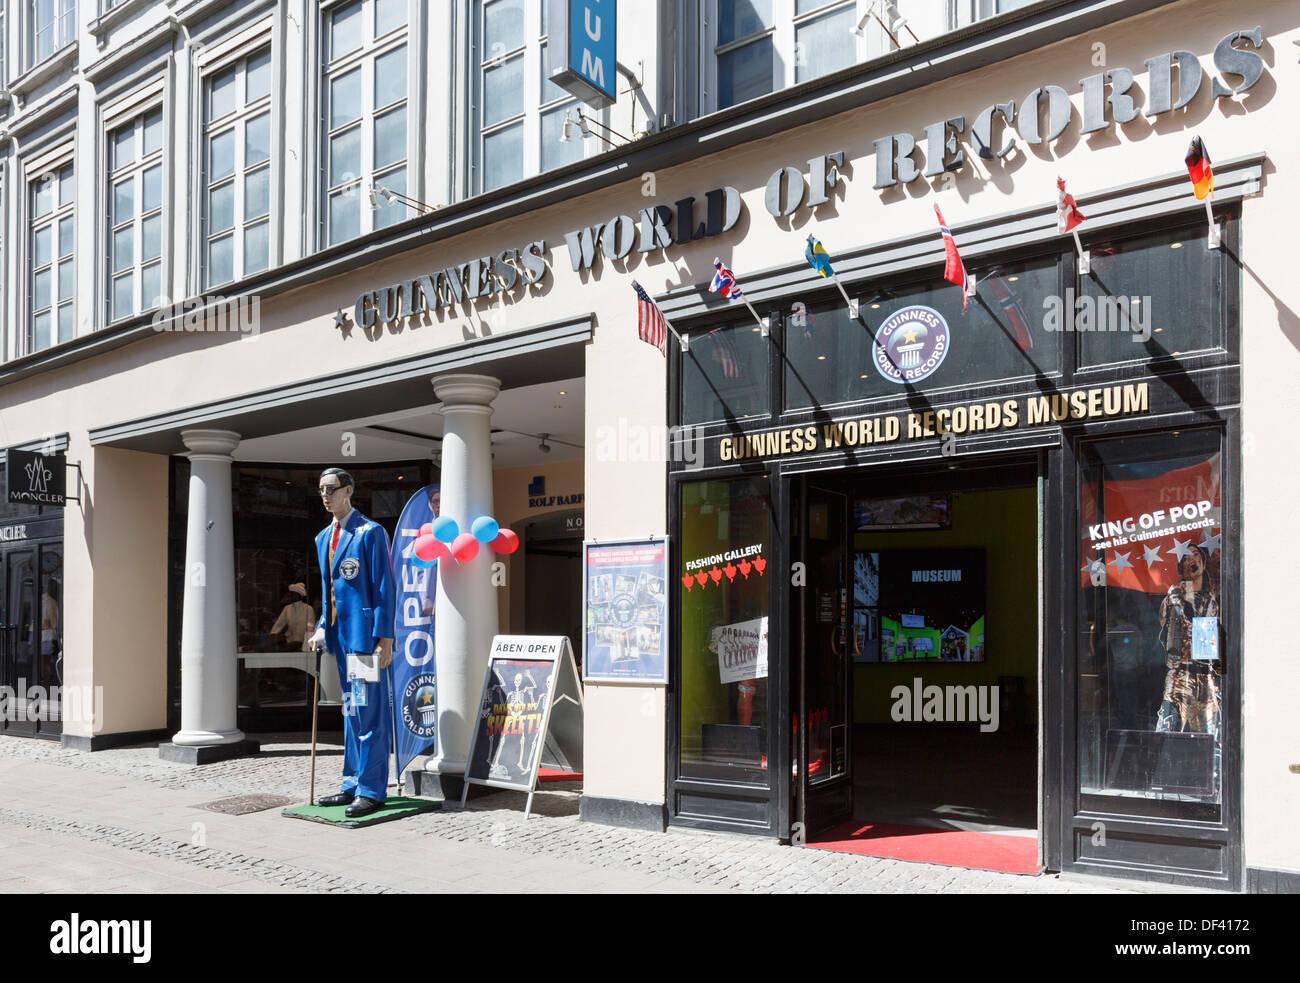 The Guinness World of Records museum front entrance in Stroget street, Copenhagen, Zealand, Denmark, Scandinavia - Stock Image